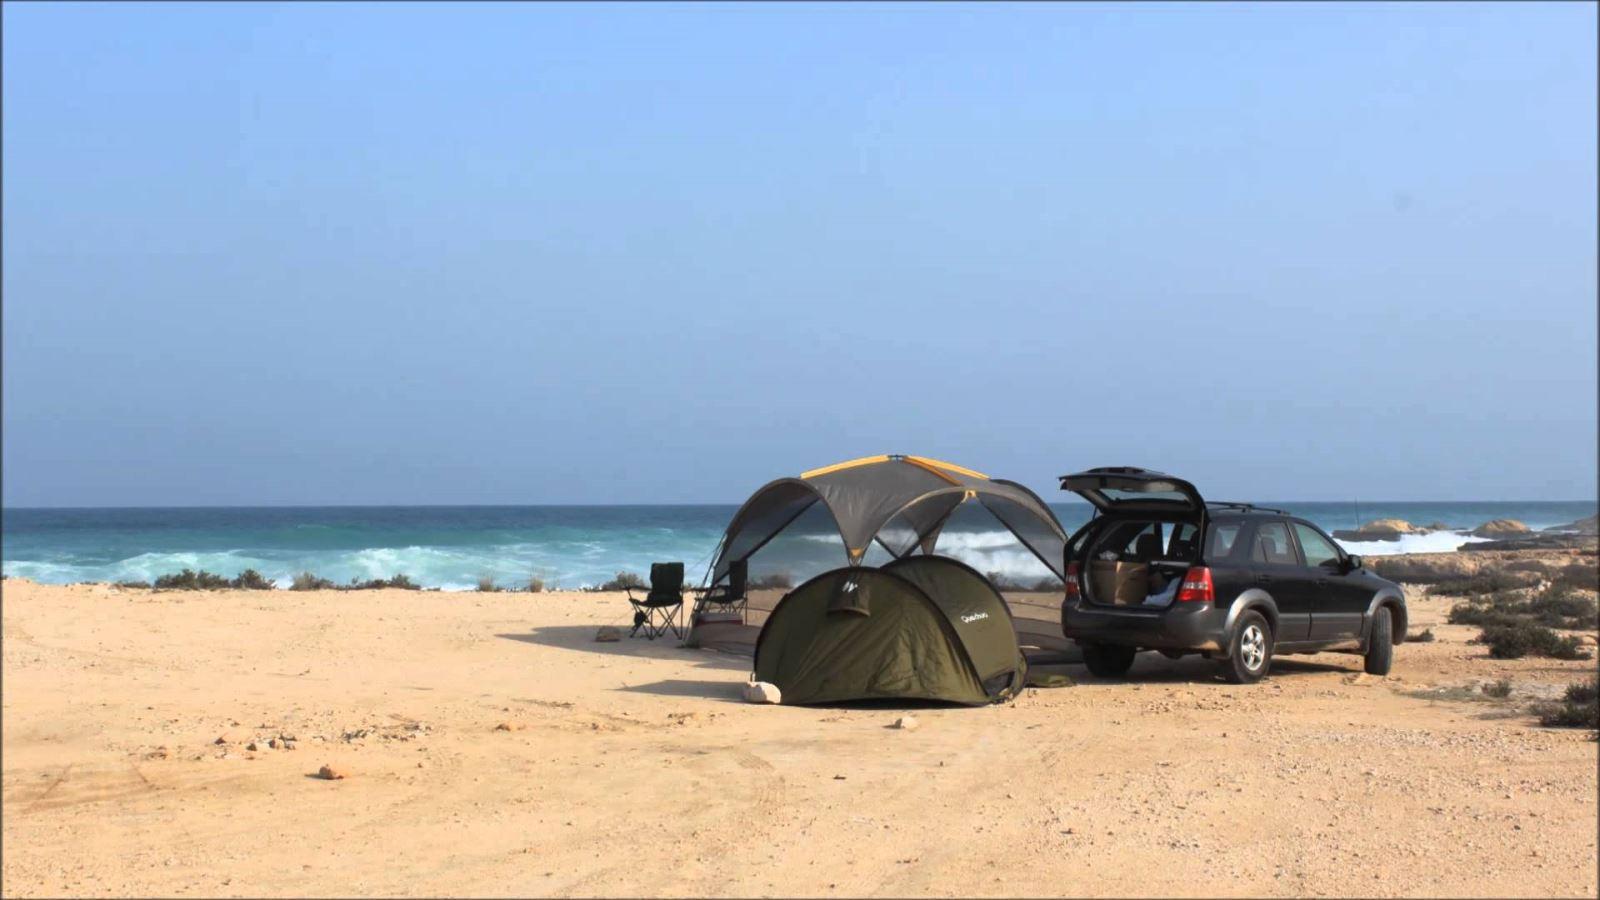 Beach camping in Oman